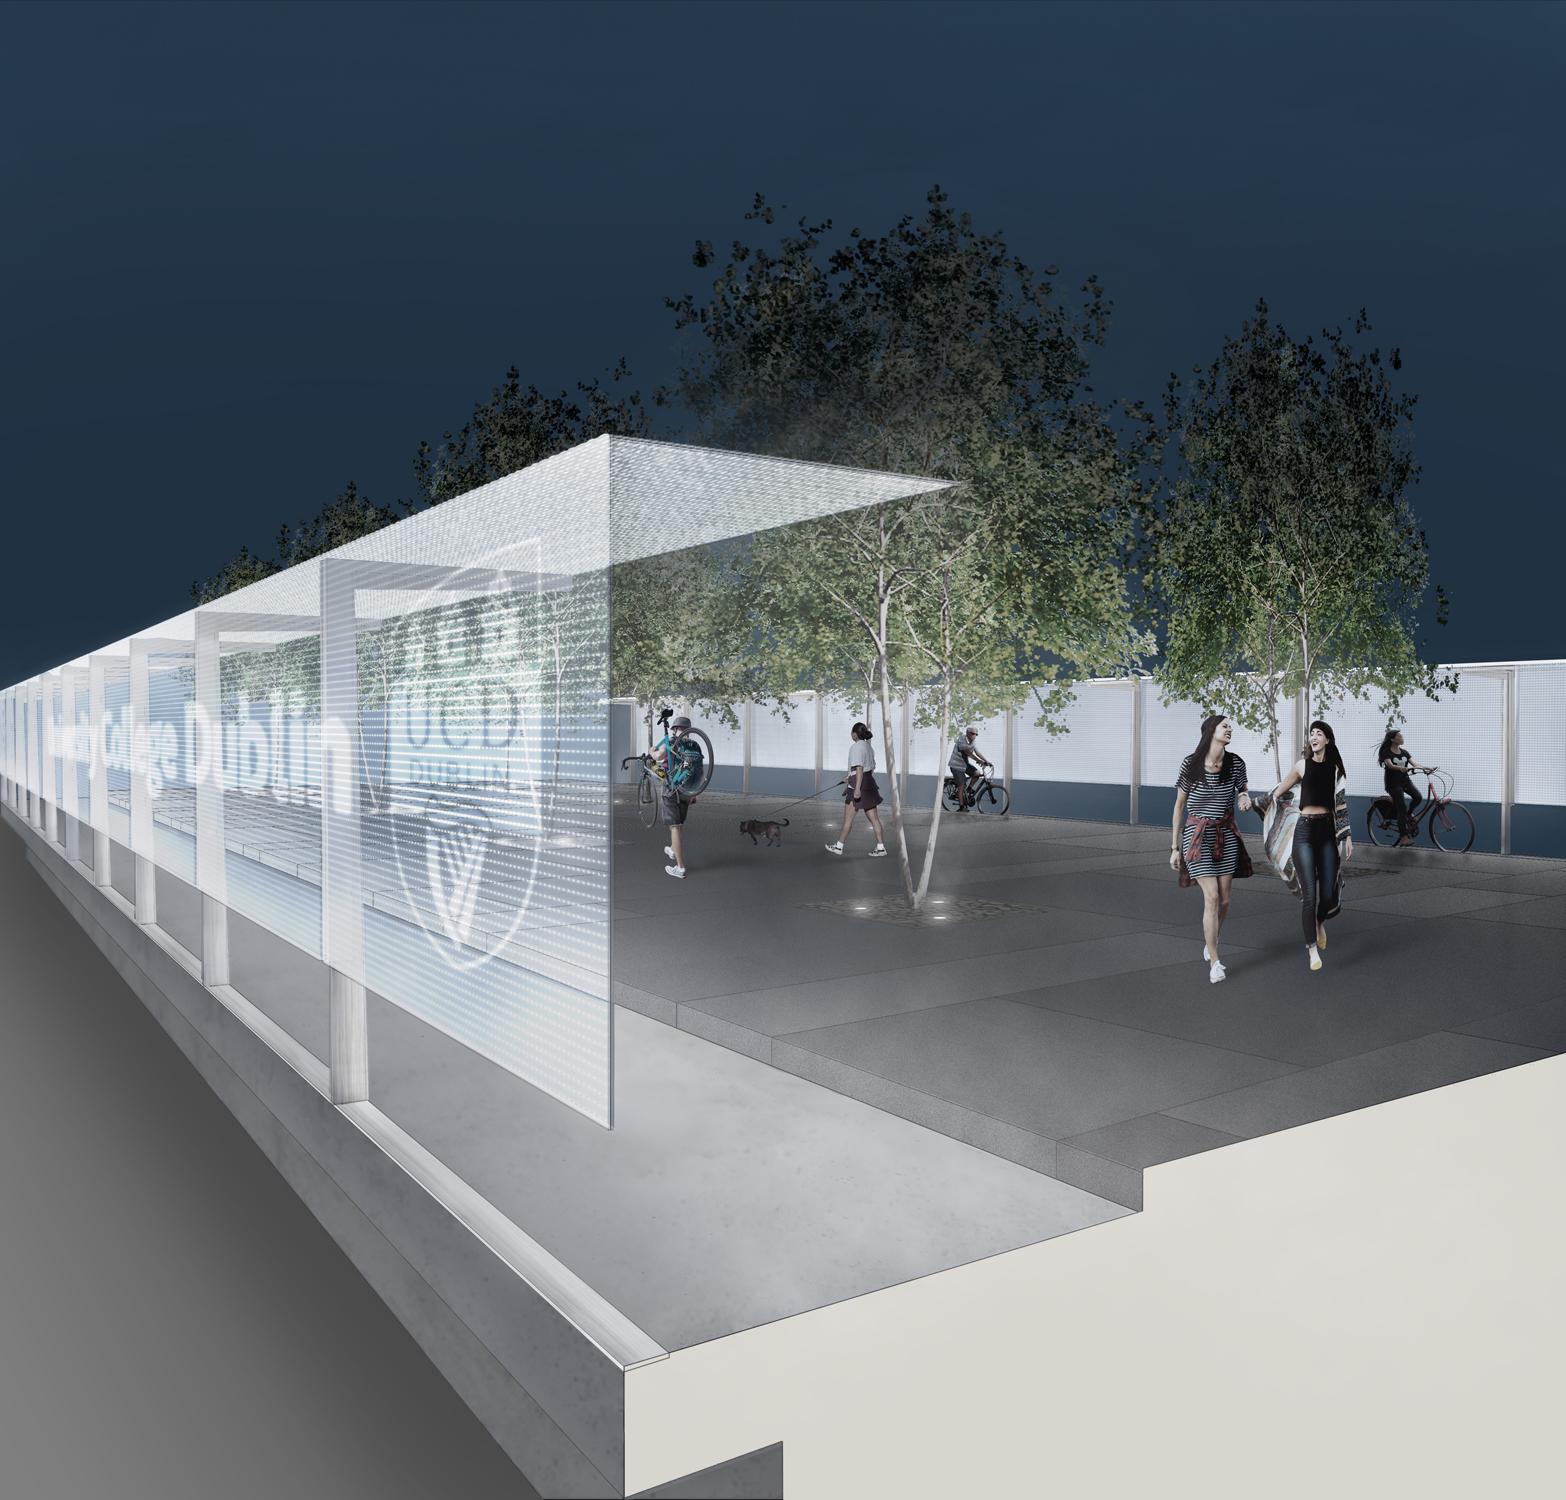 09 - a_bridge canopy rendering s.jpg